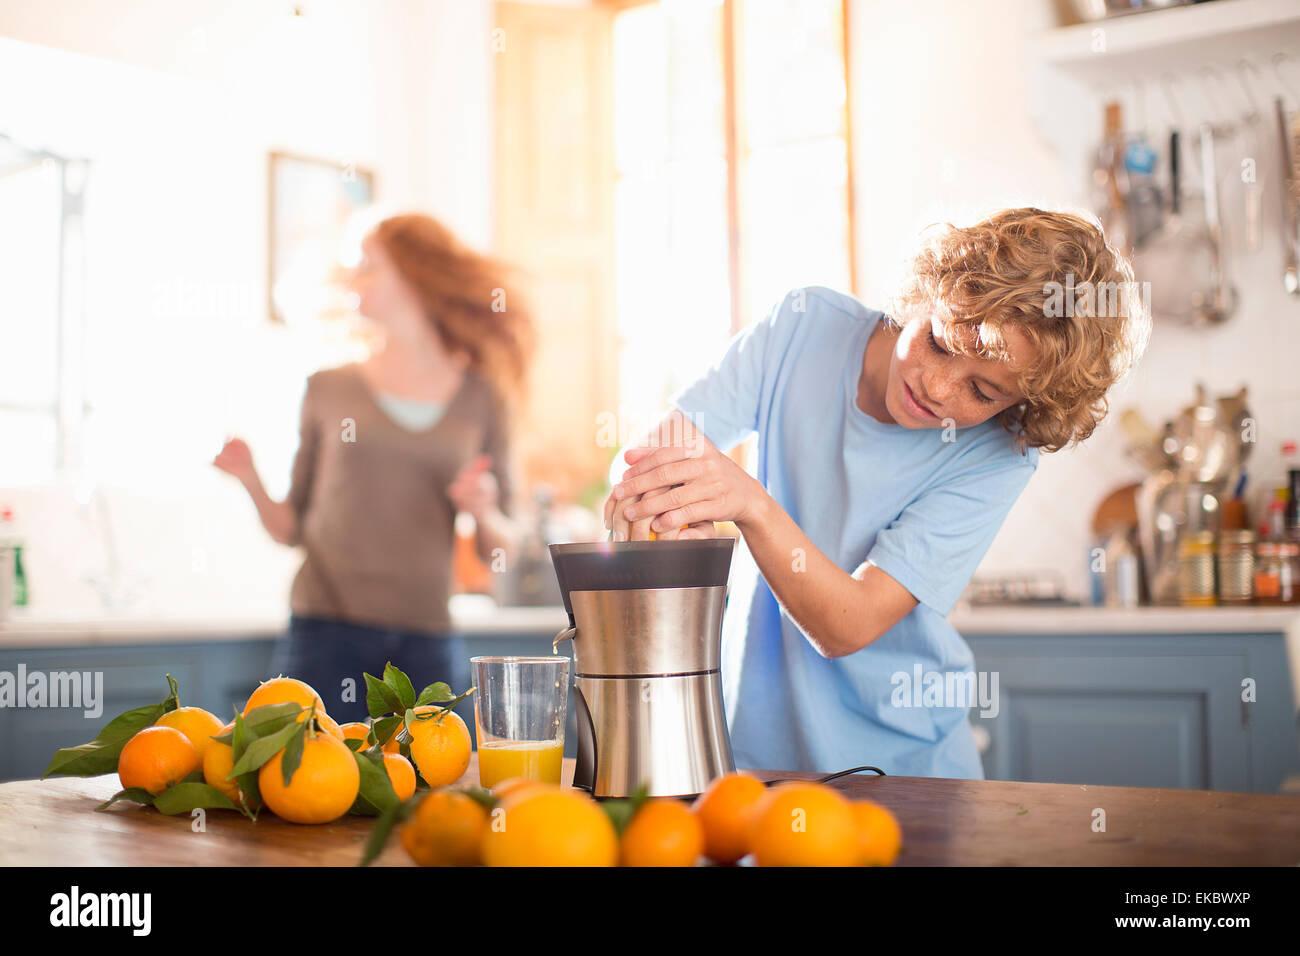 Teenage boy jus orange en cuisine Photo Stock